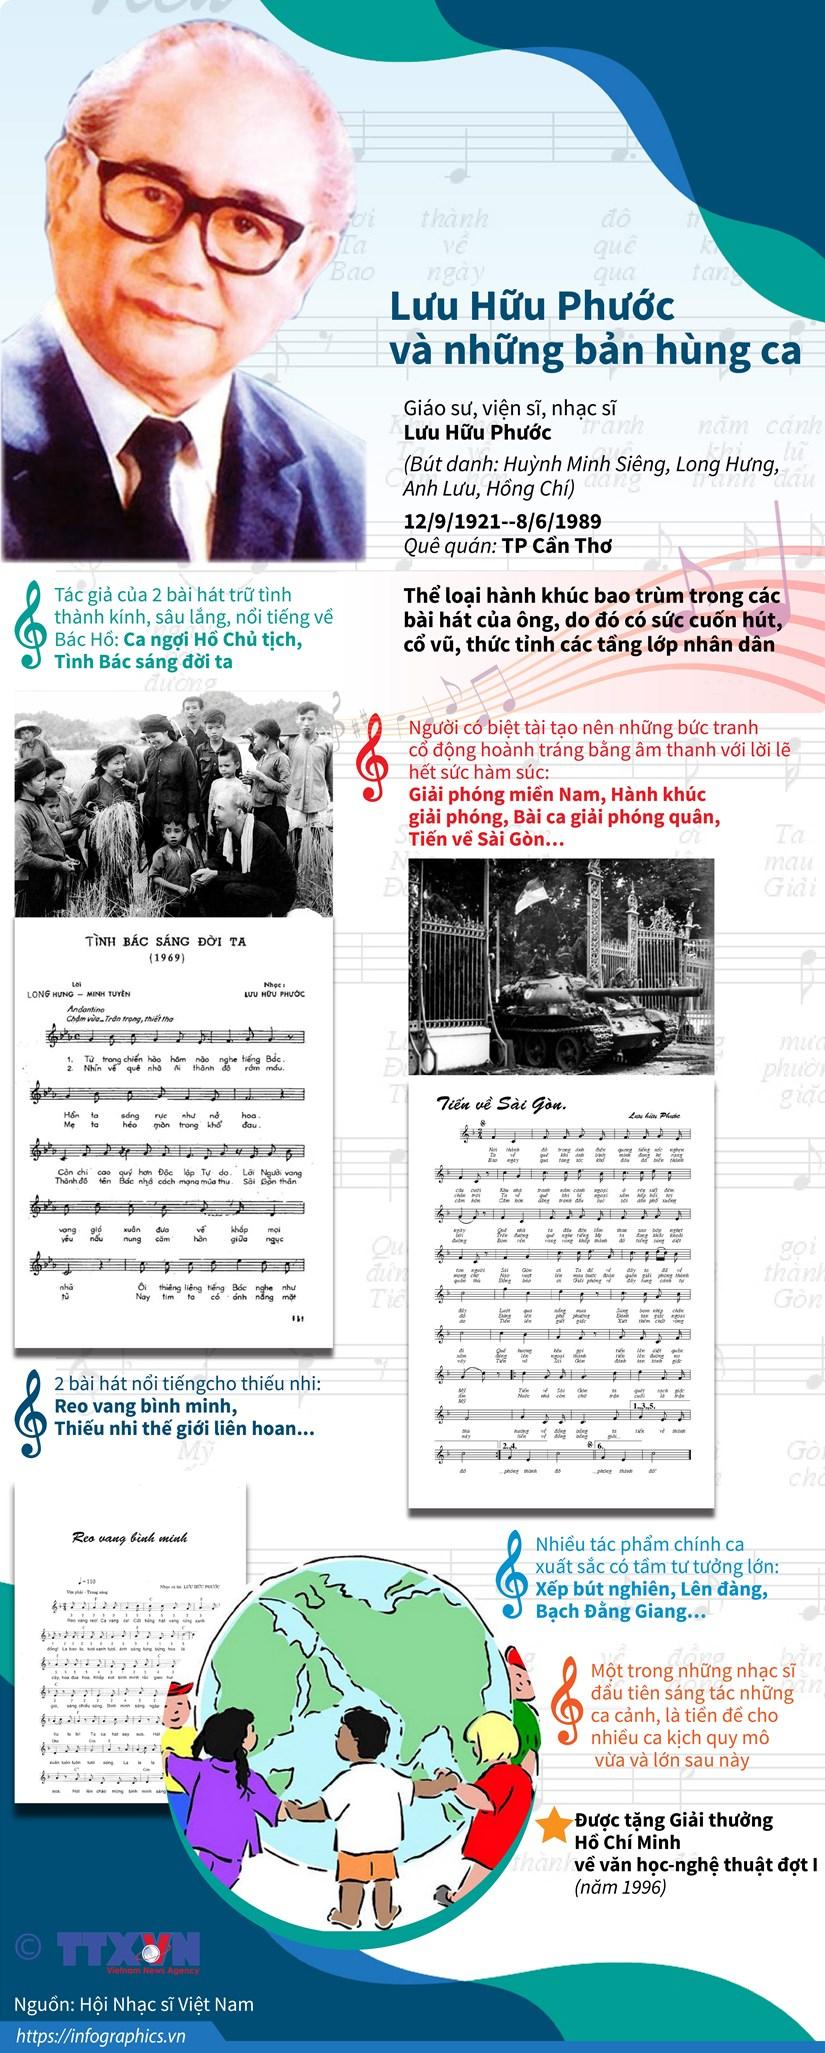 [Infographics] Nhac sy Luu Huu Phuoc va nhung ban hung ca hinh anh 1